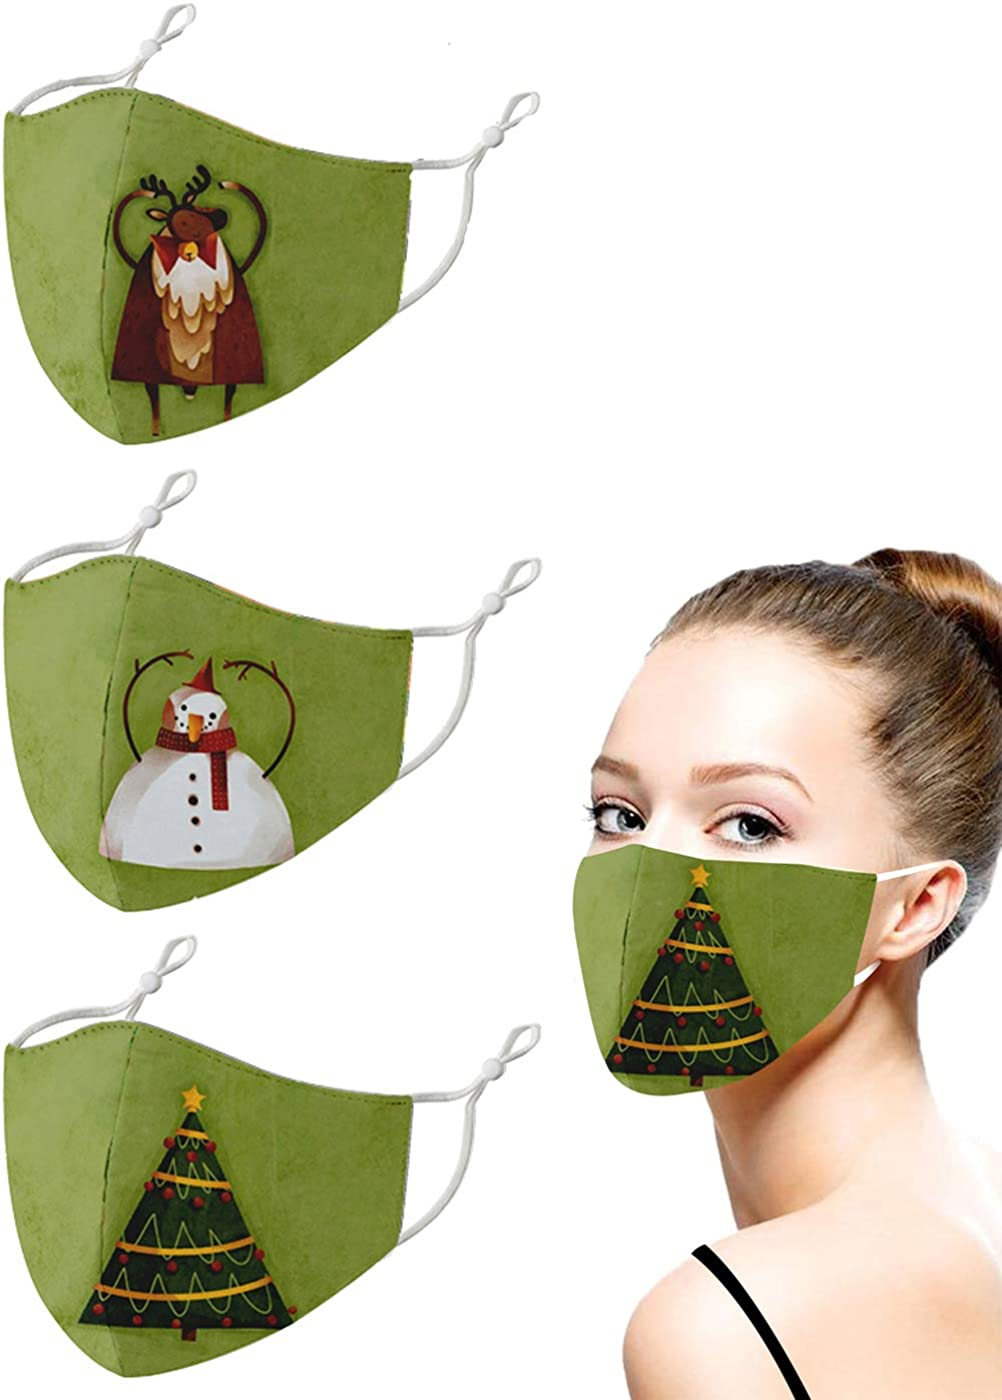 Fashion Christmas Santa Claus Printed Cloth Mask forMen Women, Reusable Adjustable Ear Loops Holiday Xmas Face Covering